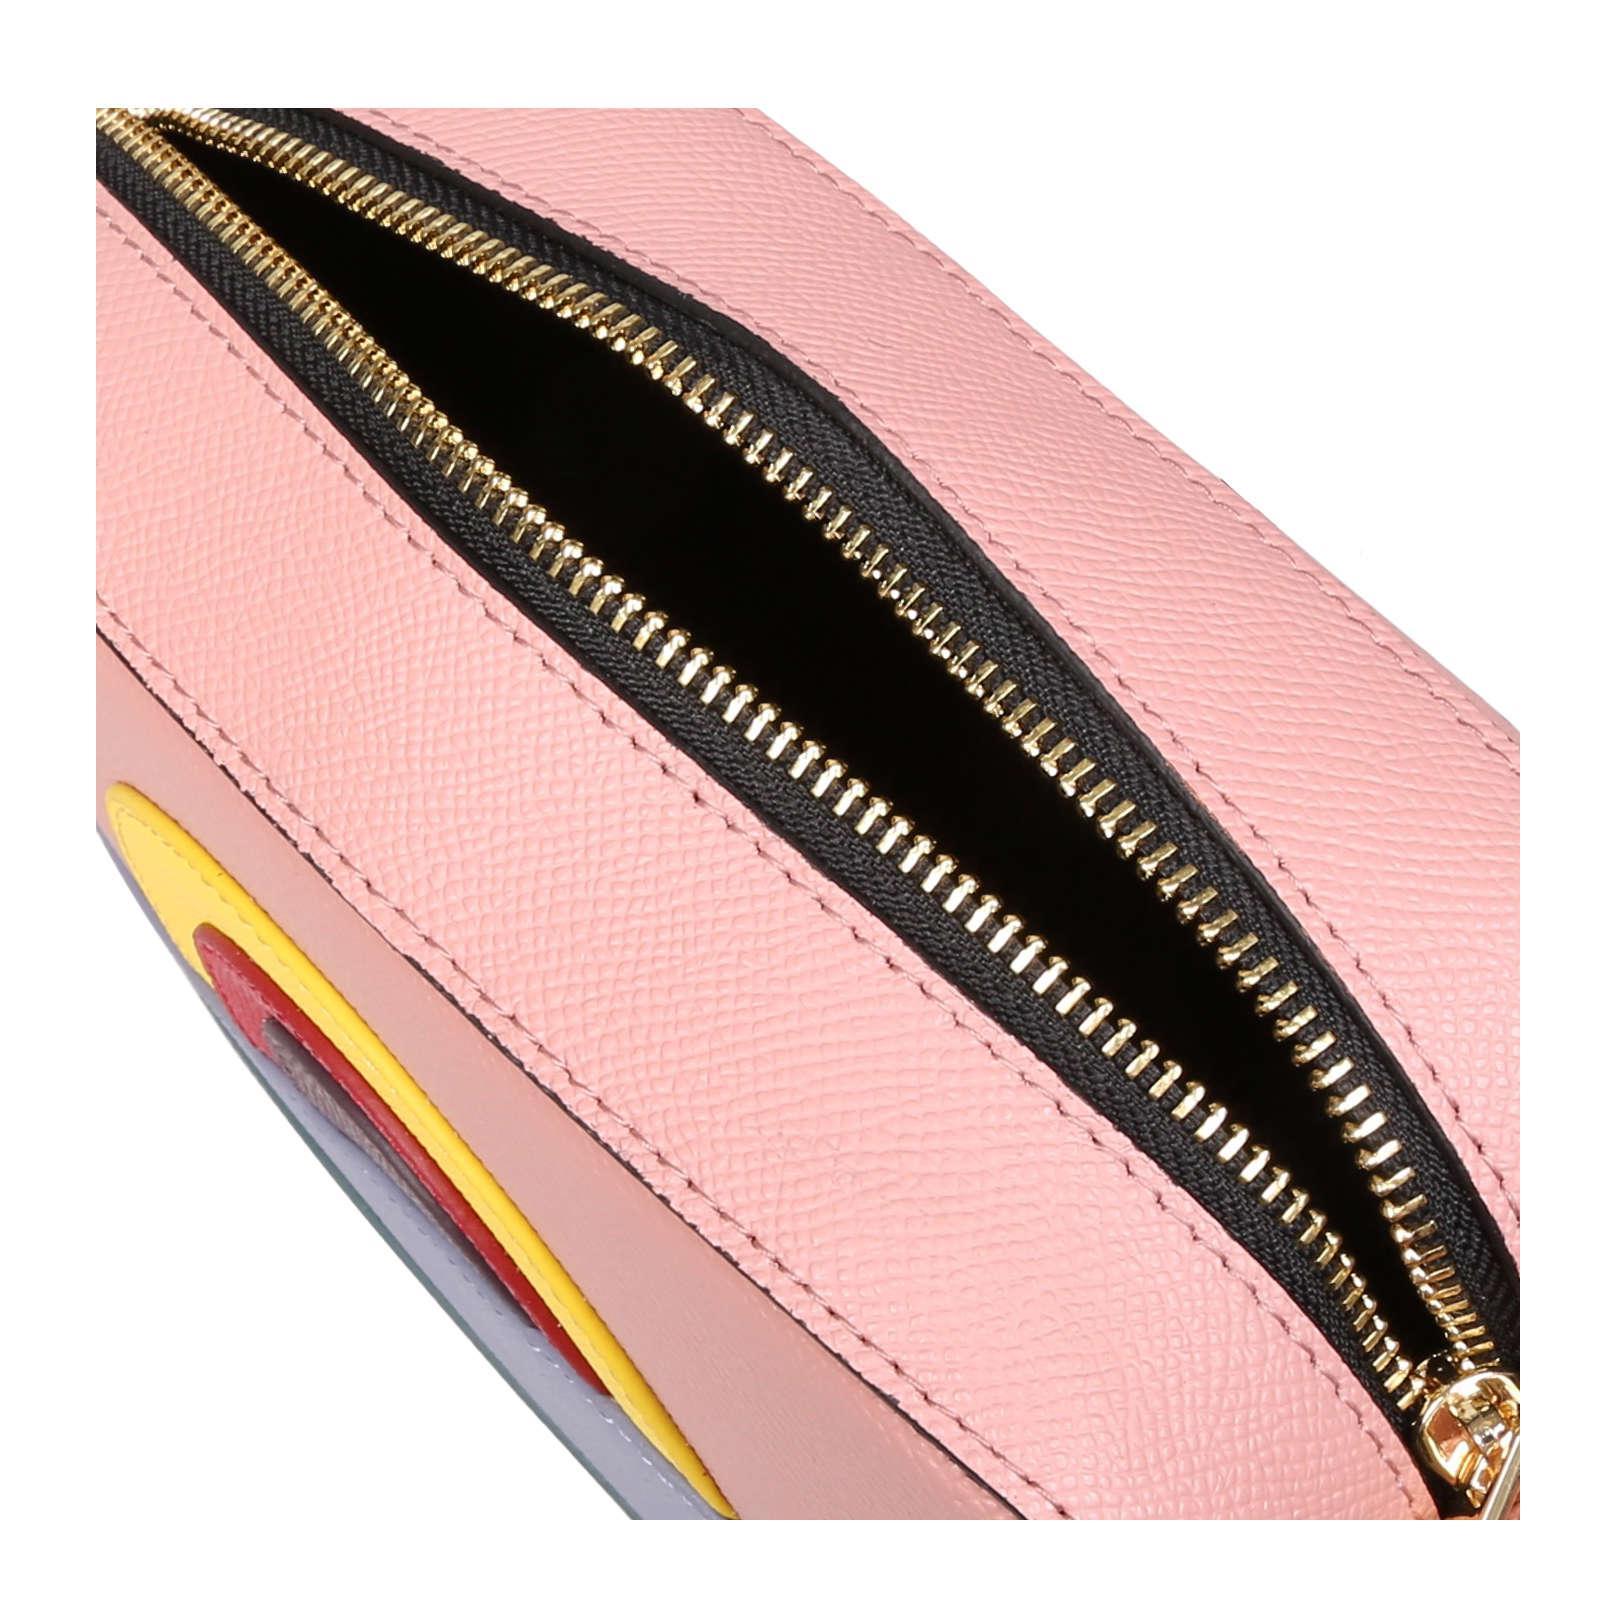 Kurt Geiger Leather Richmond Cross Body In Pink Combination